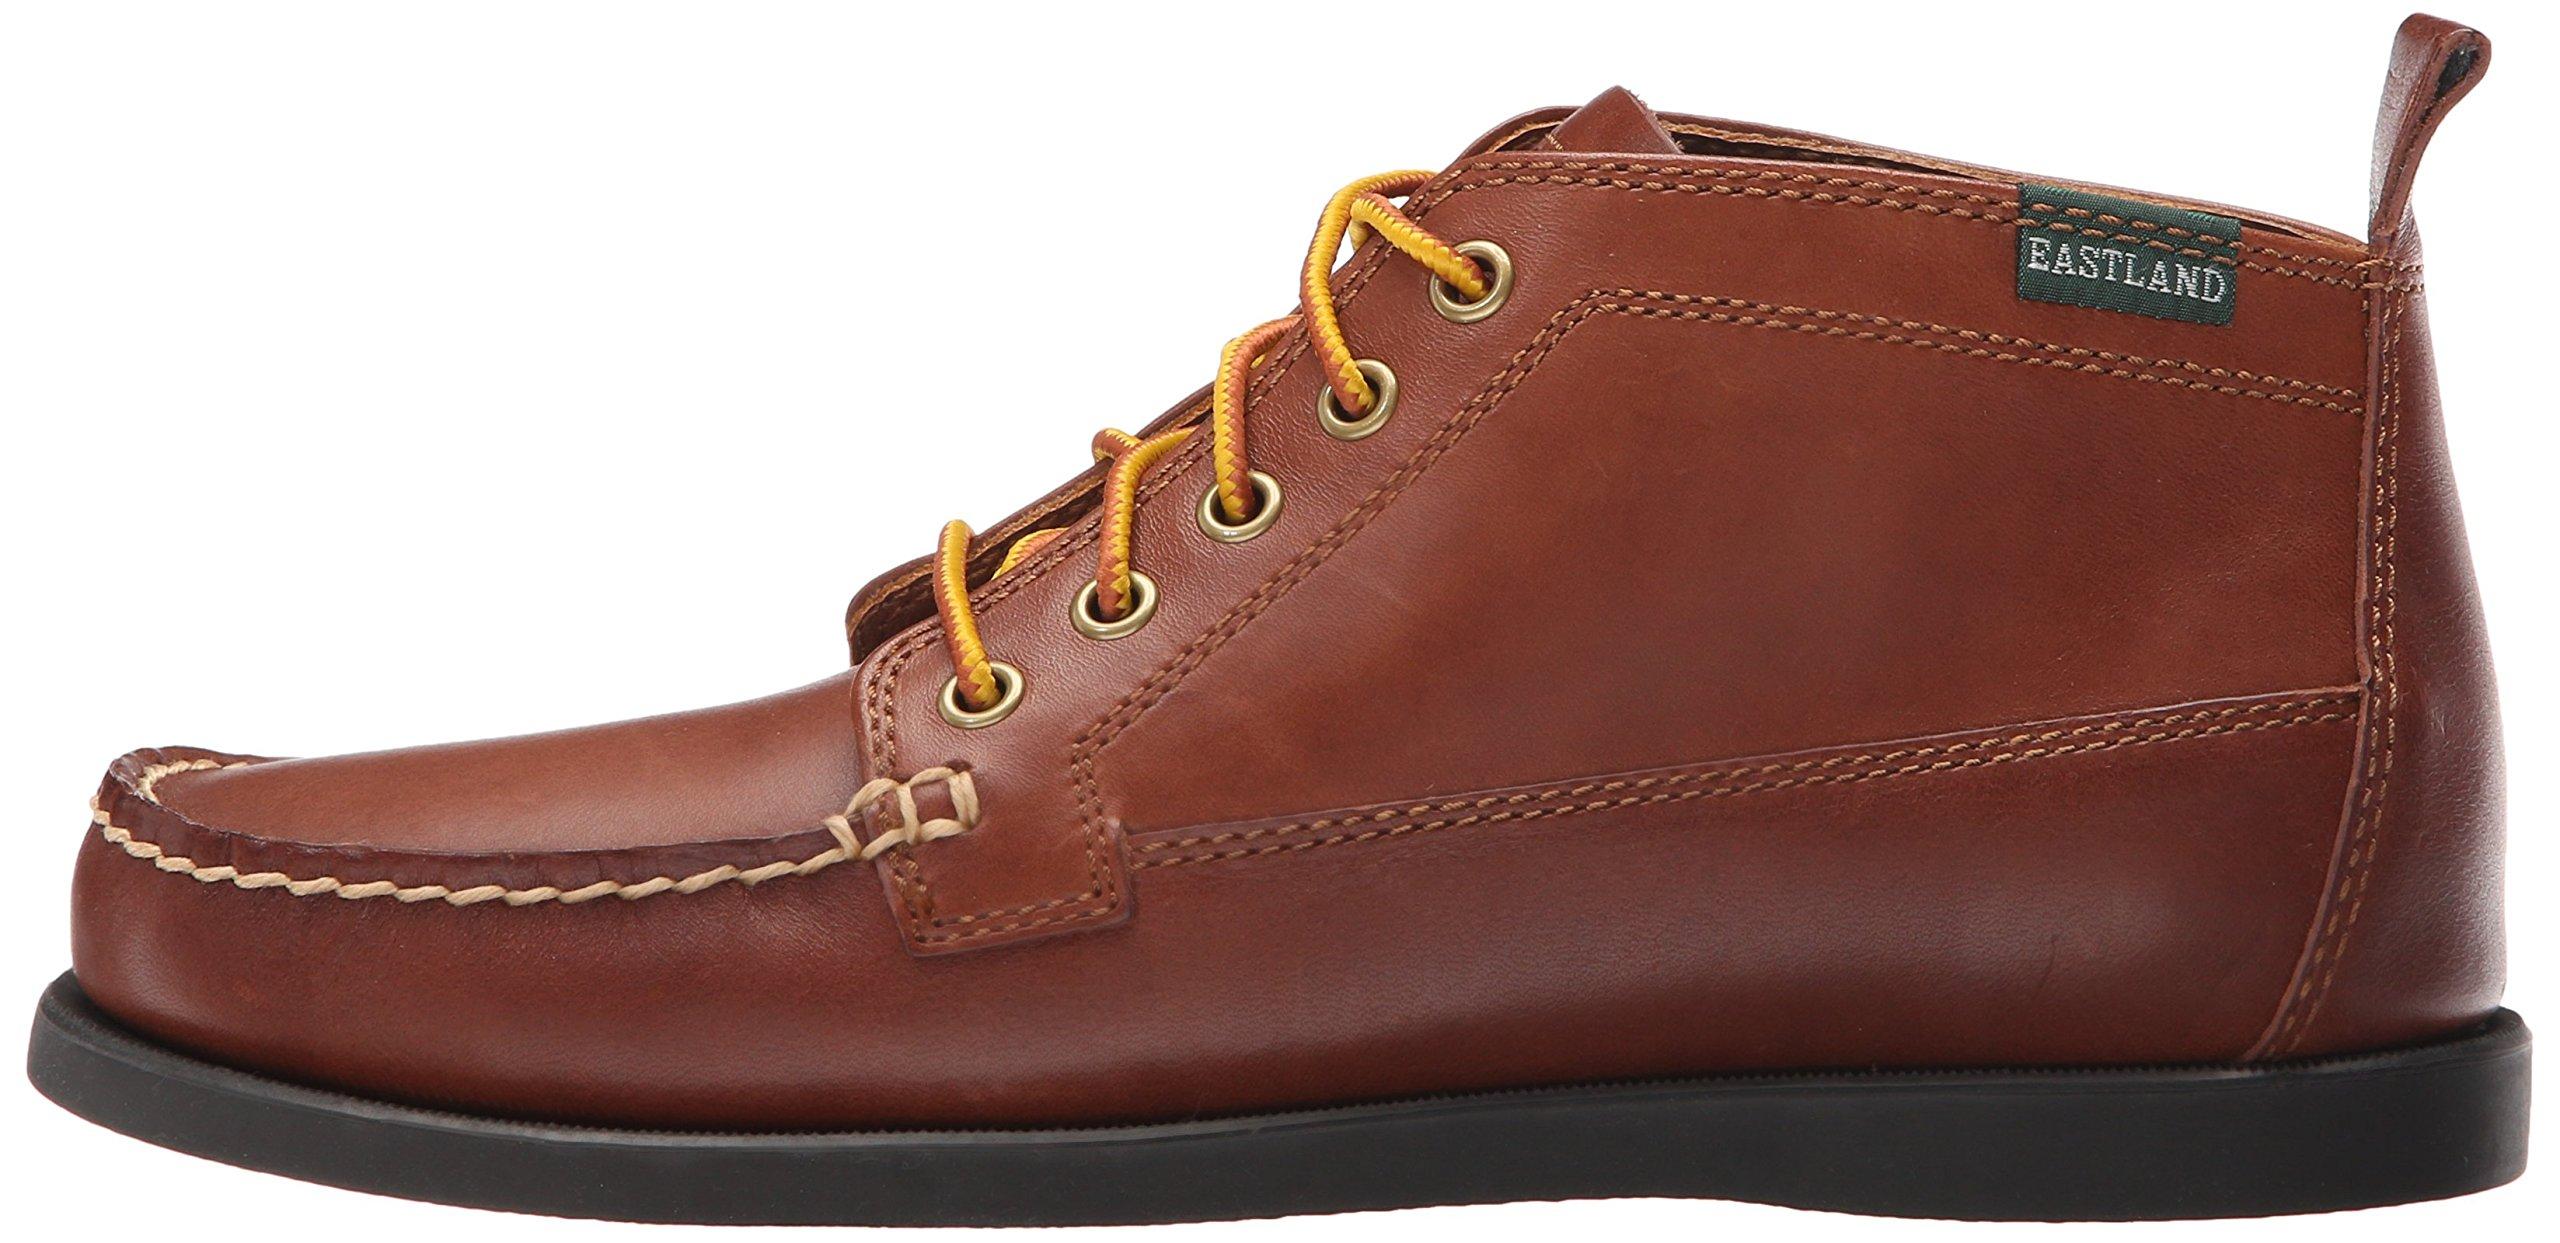 Eastland Men's Seneca Chukka Boot, Tan, 14 W US by Eastland (Image #5)